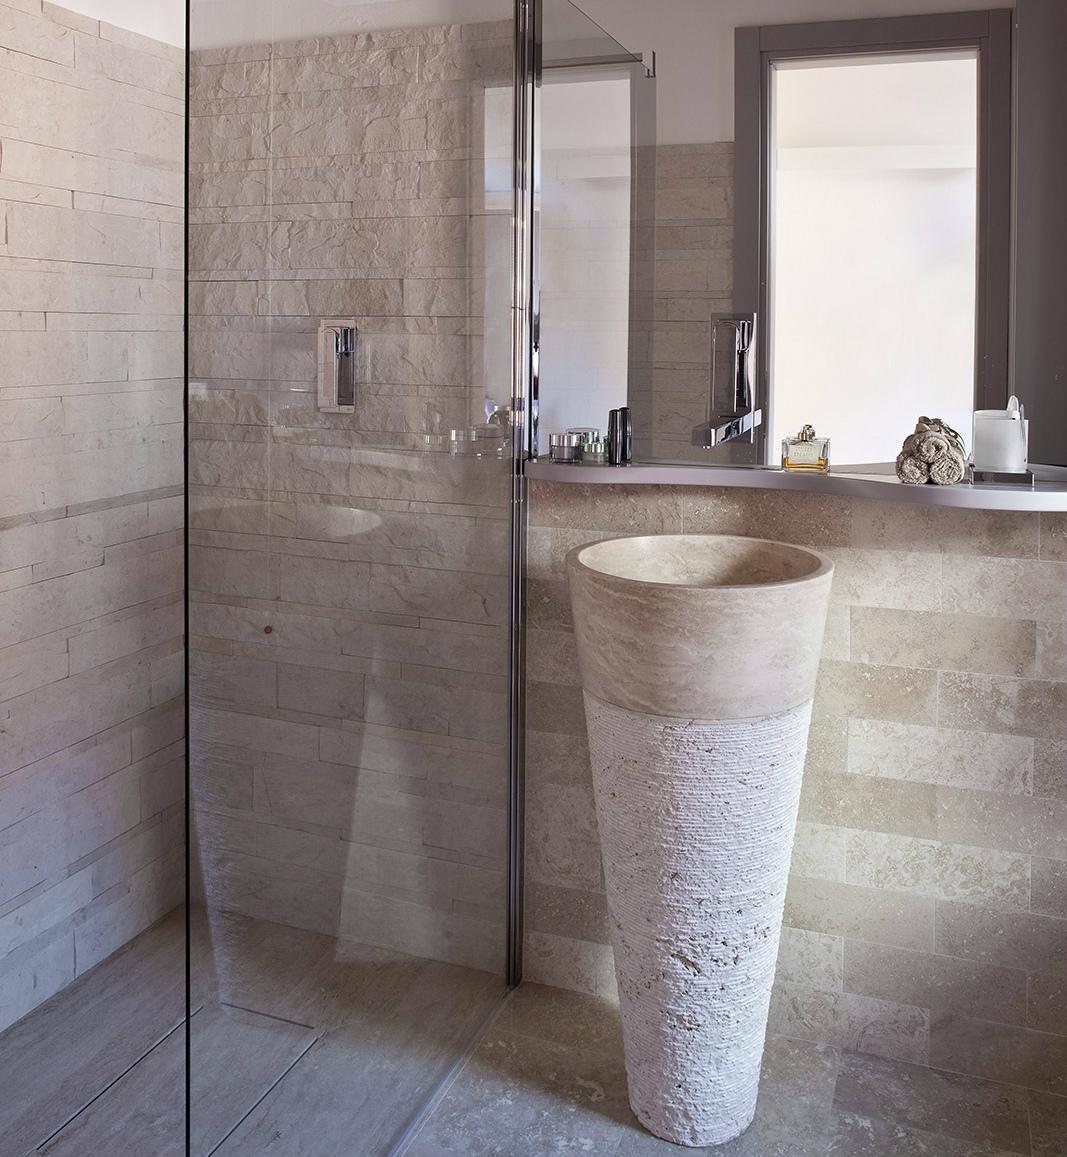 rivestimenti in mosaico per box doccia | mosaici bagno by pietre ... - Bagni Moderni Beige